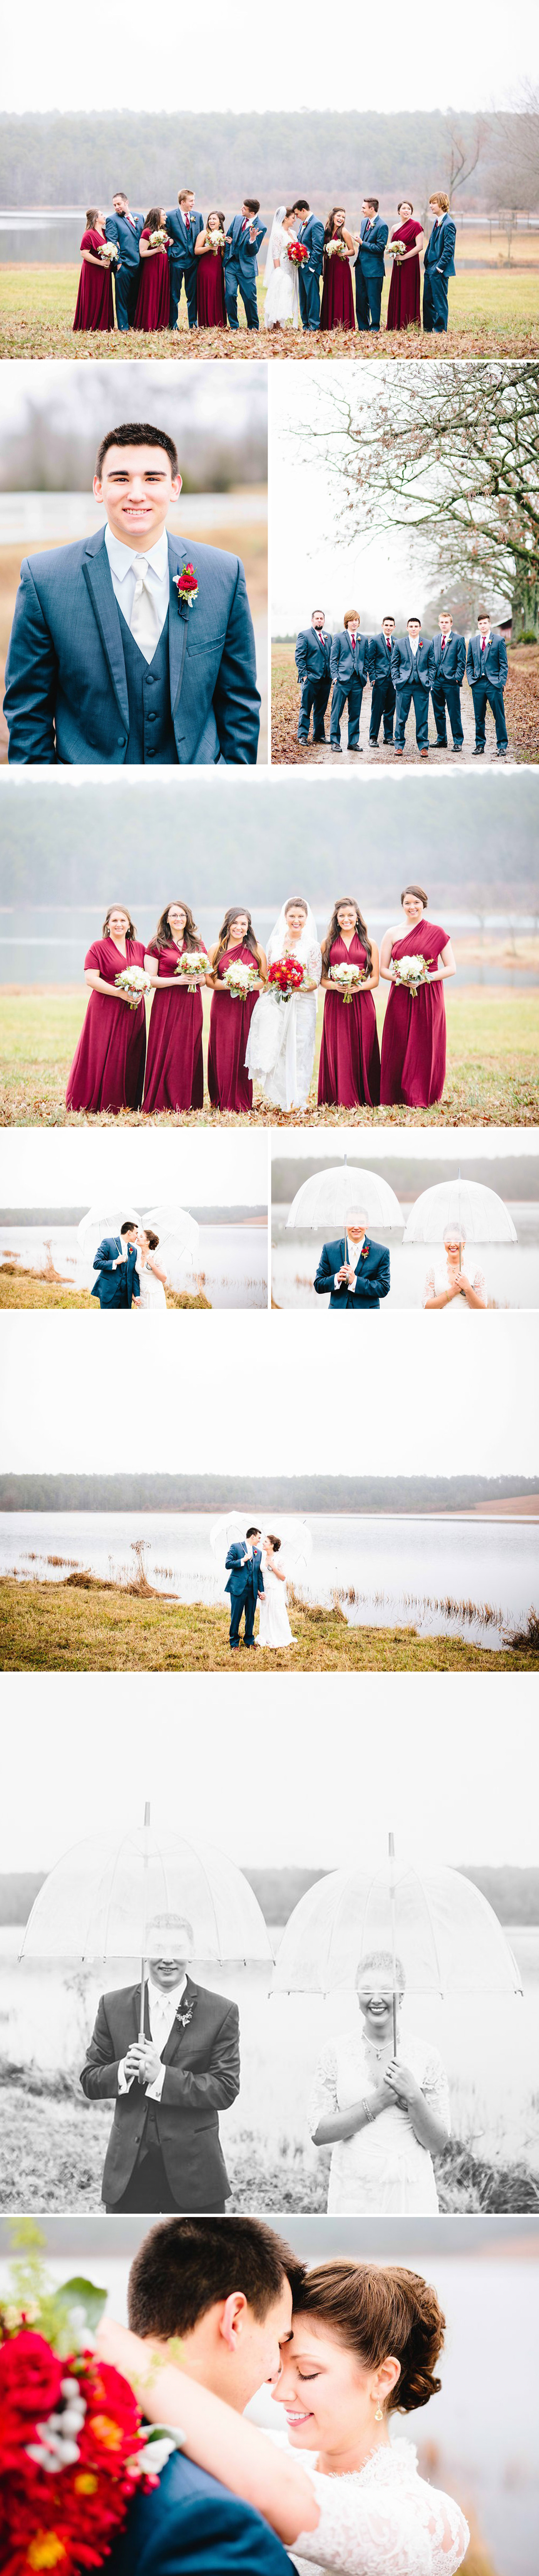 chicago-fine-art-wedding-photography-imhoff3